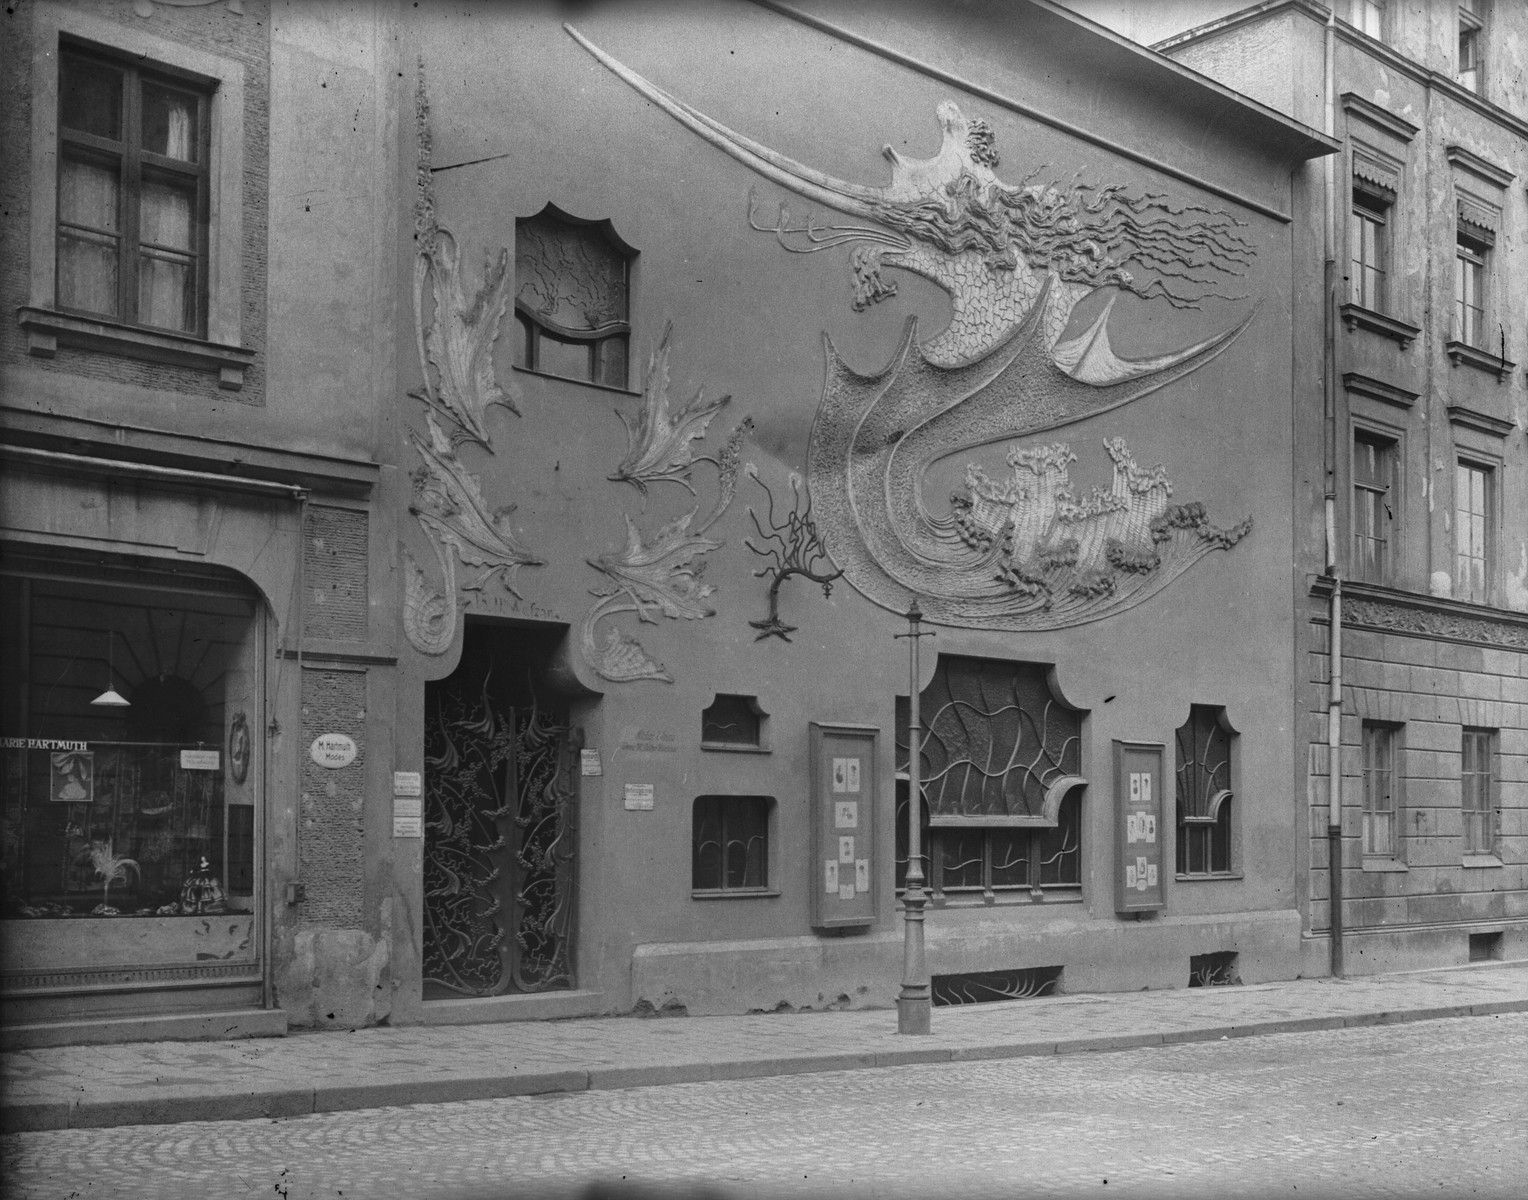 august endell facade of hof atelier munich 1897 art nouveau pinterest. Black Bedroom Furniture Sets. Home Design Ideas